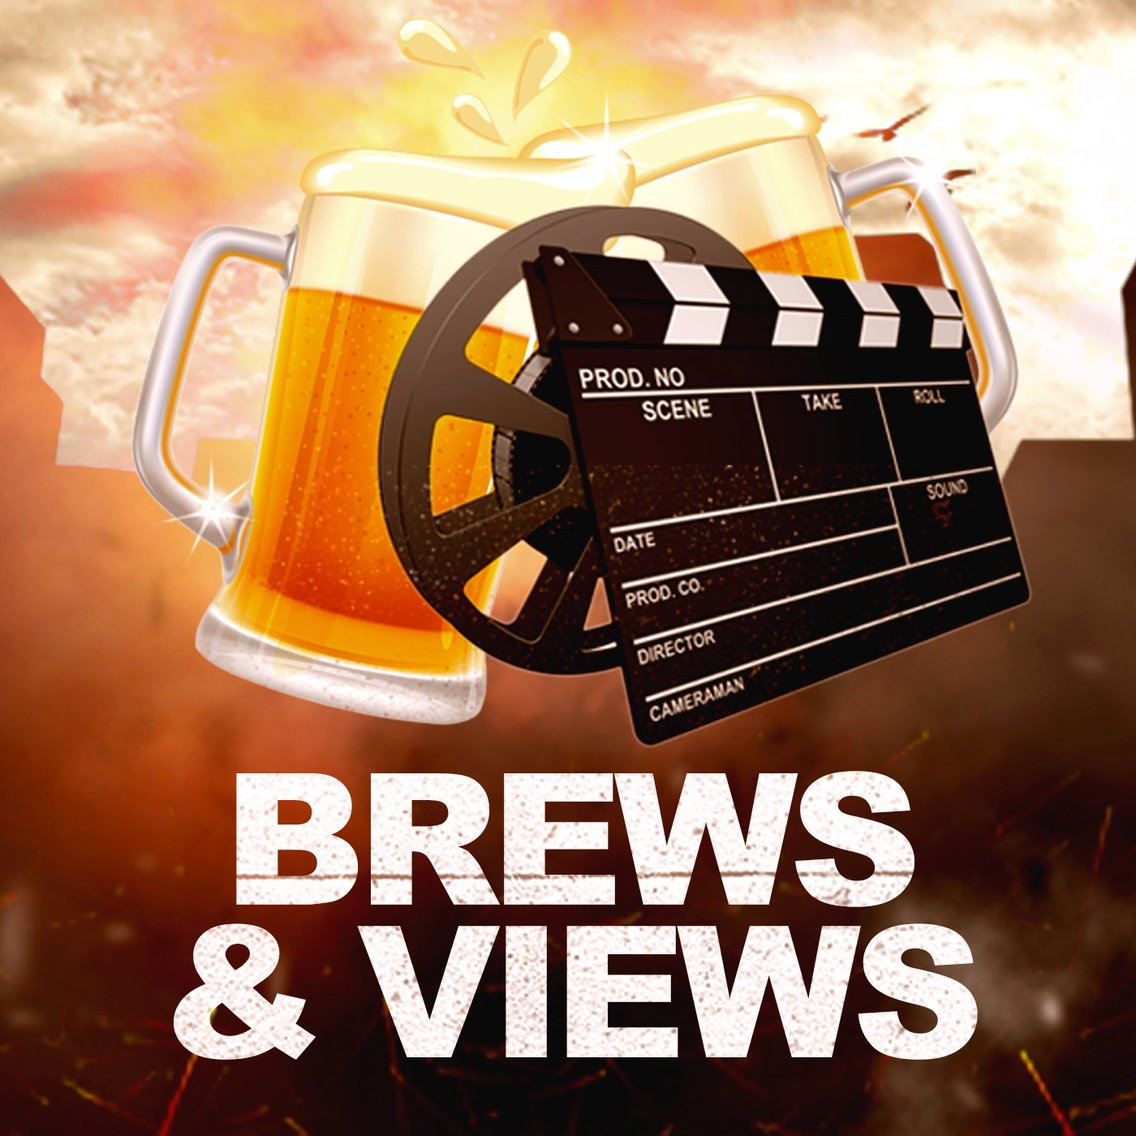 Brews & Views - imagen de portada